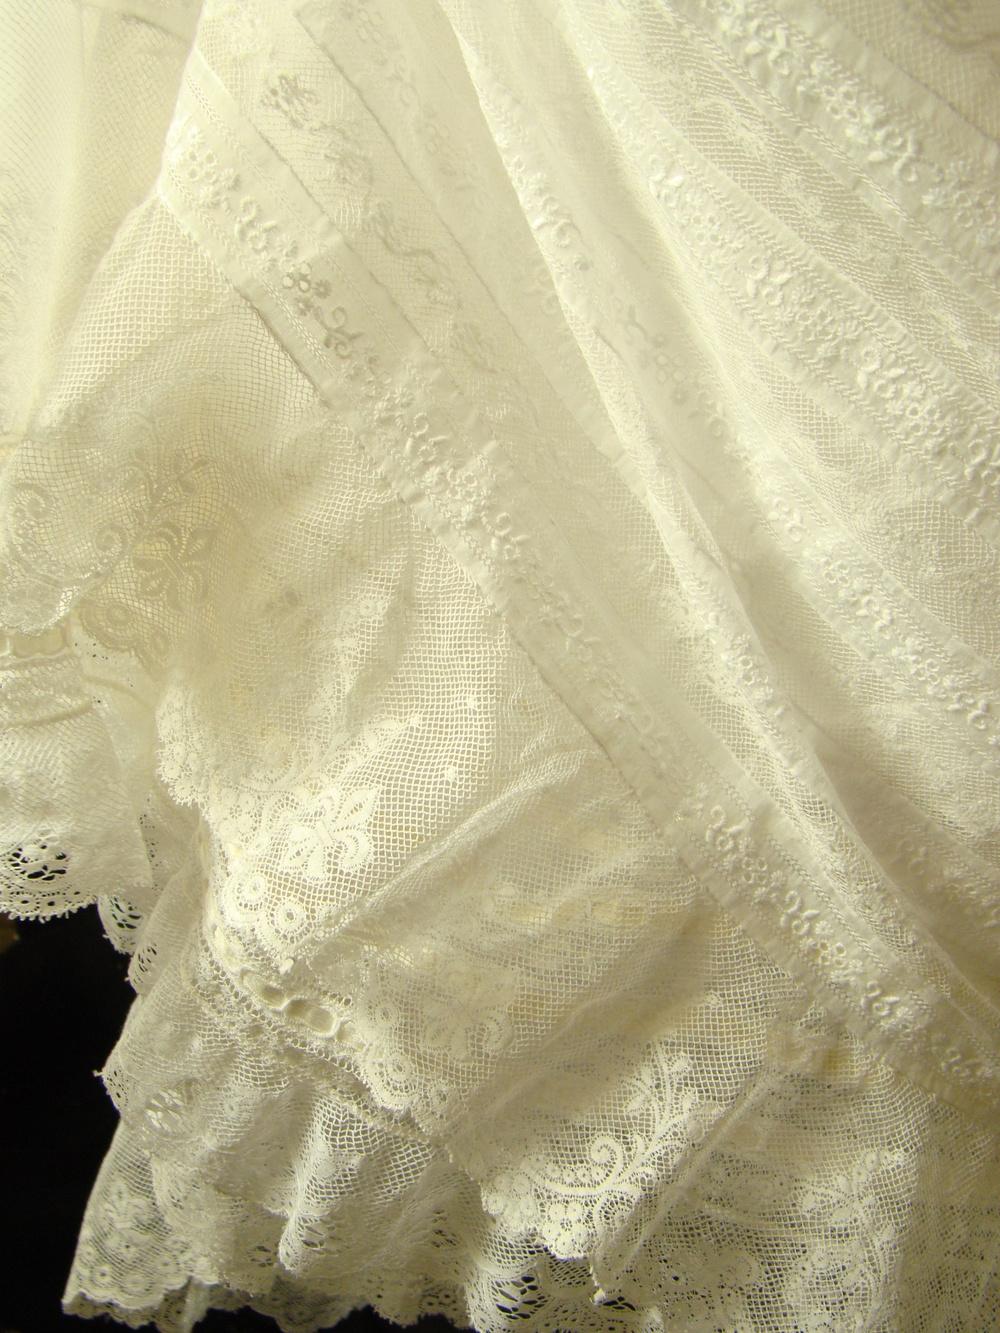 gowns3 068.JPG